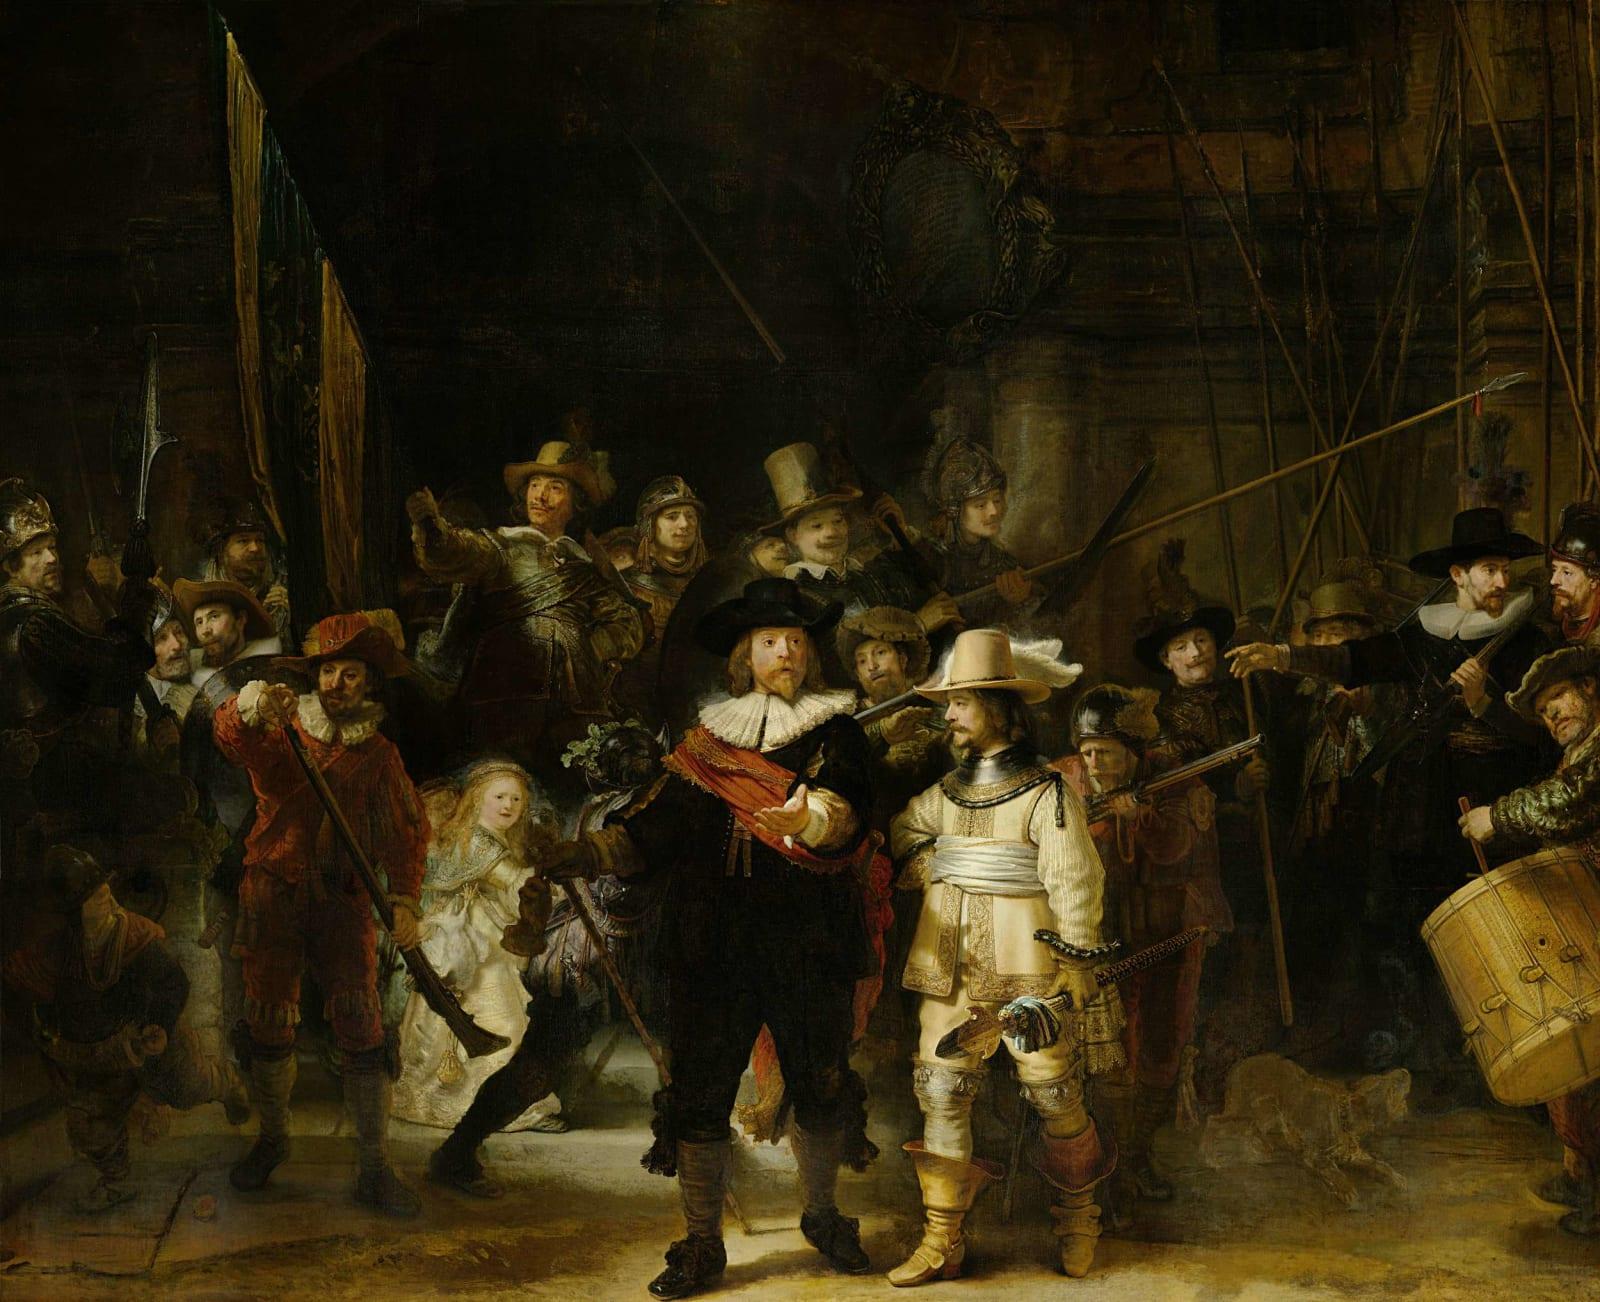 Rembrandt, Militia Company of District II under the Command of Captain Frans Banninck Cocq, 1837